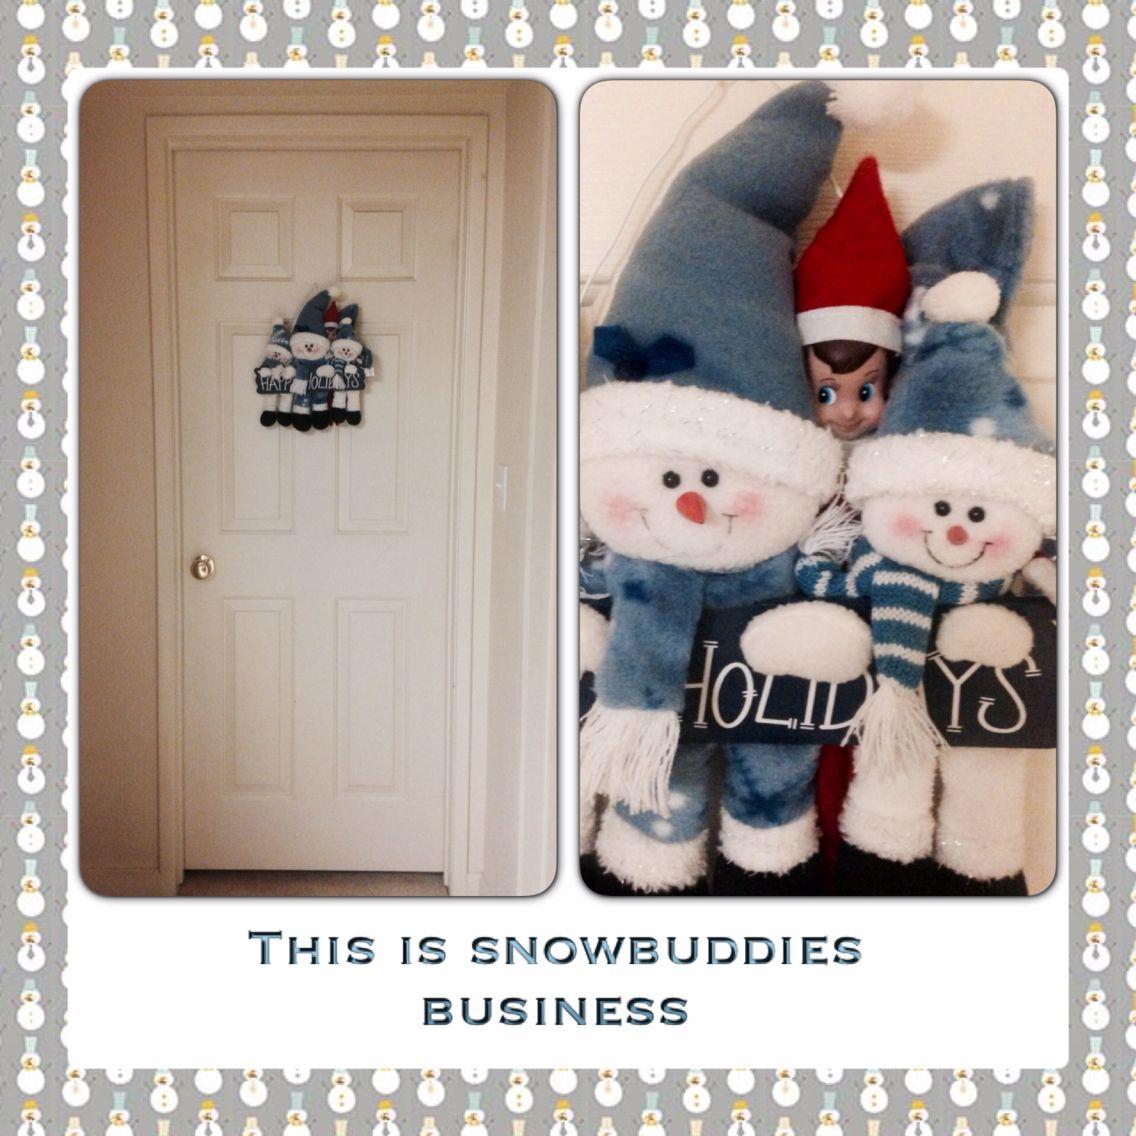 Snowbuddies business